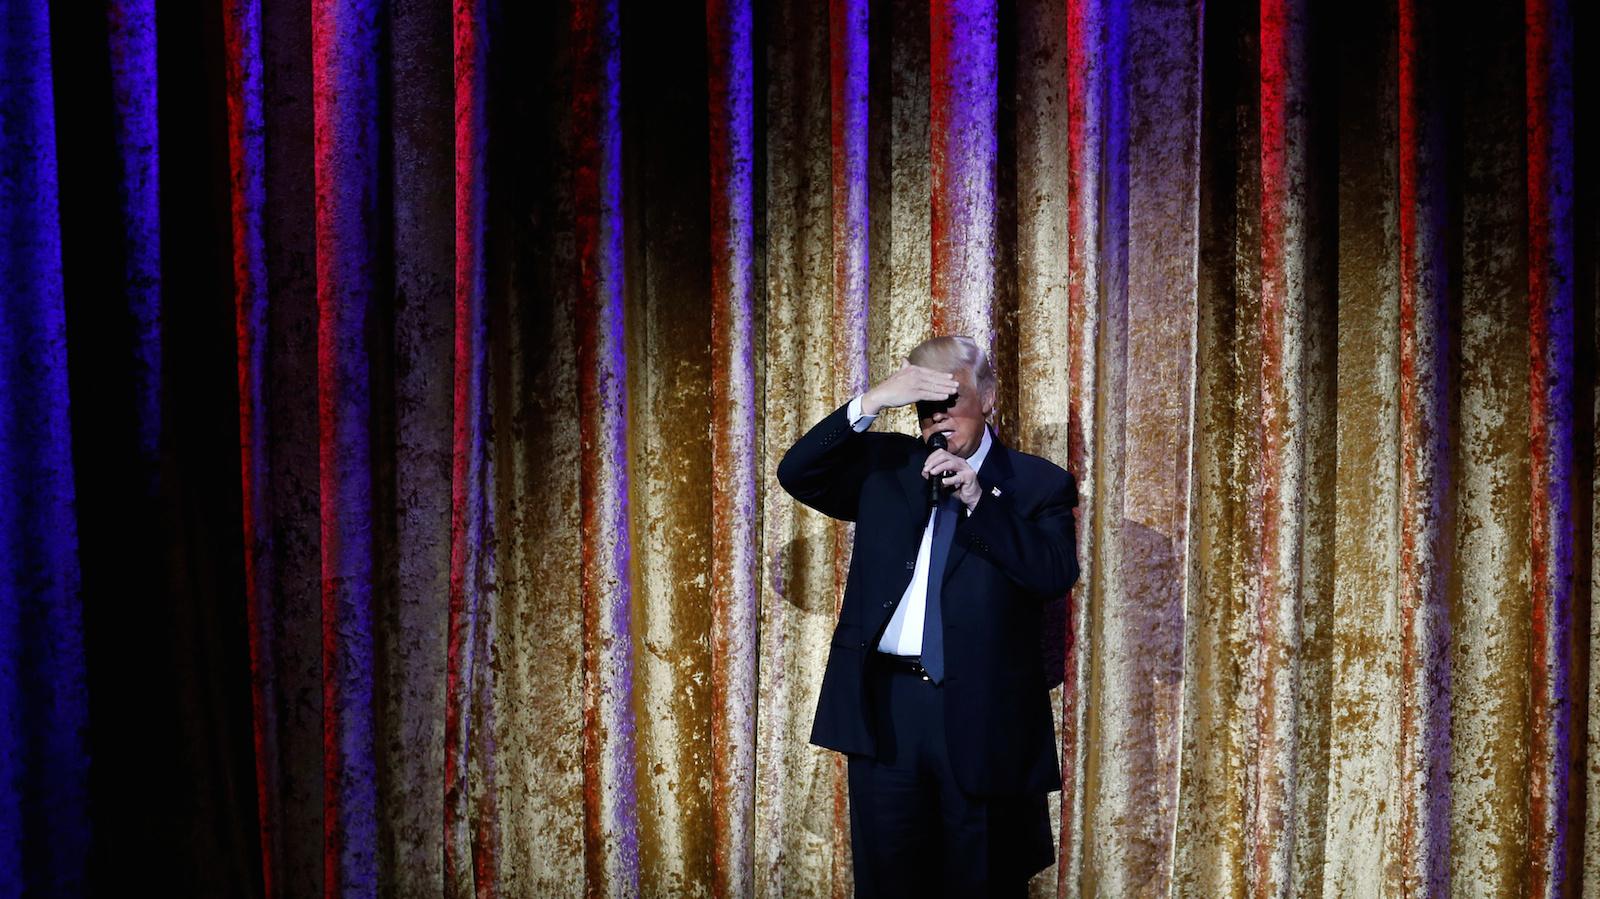 Syneidesis, a billionaires' club run by William Doll, wants